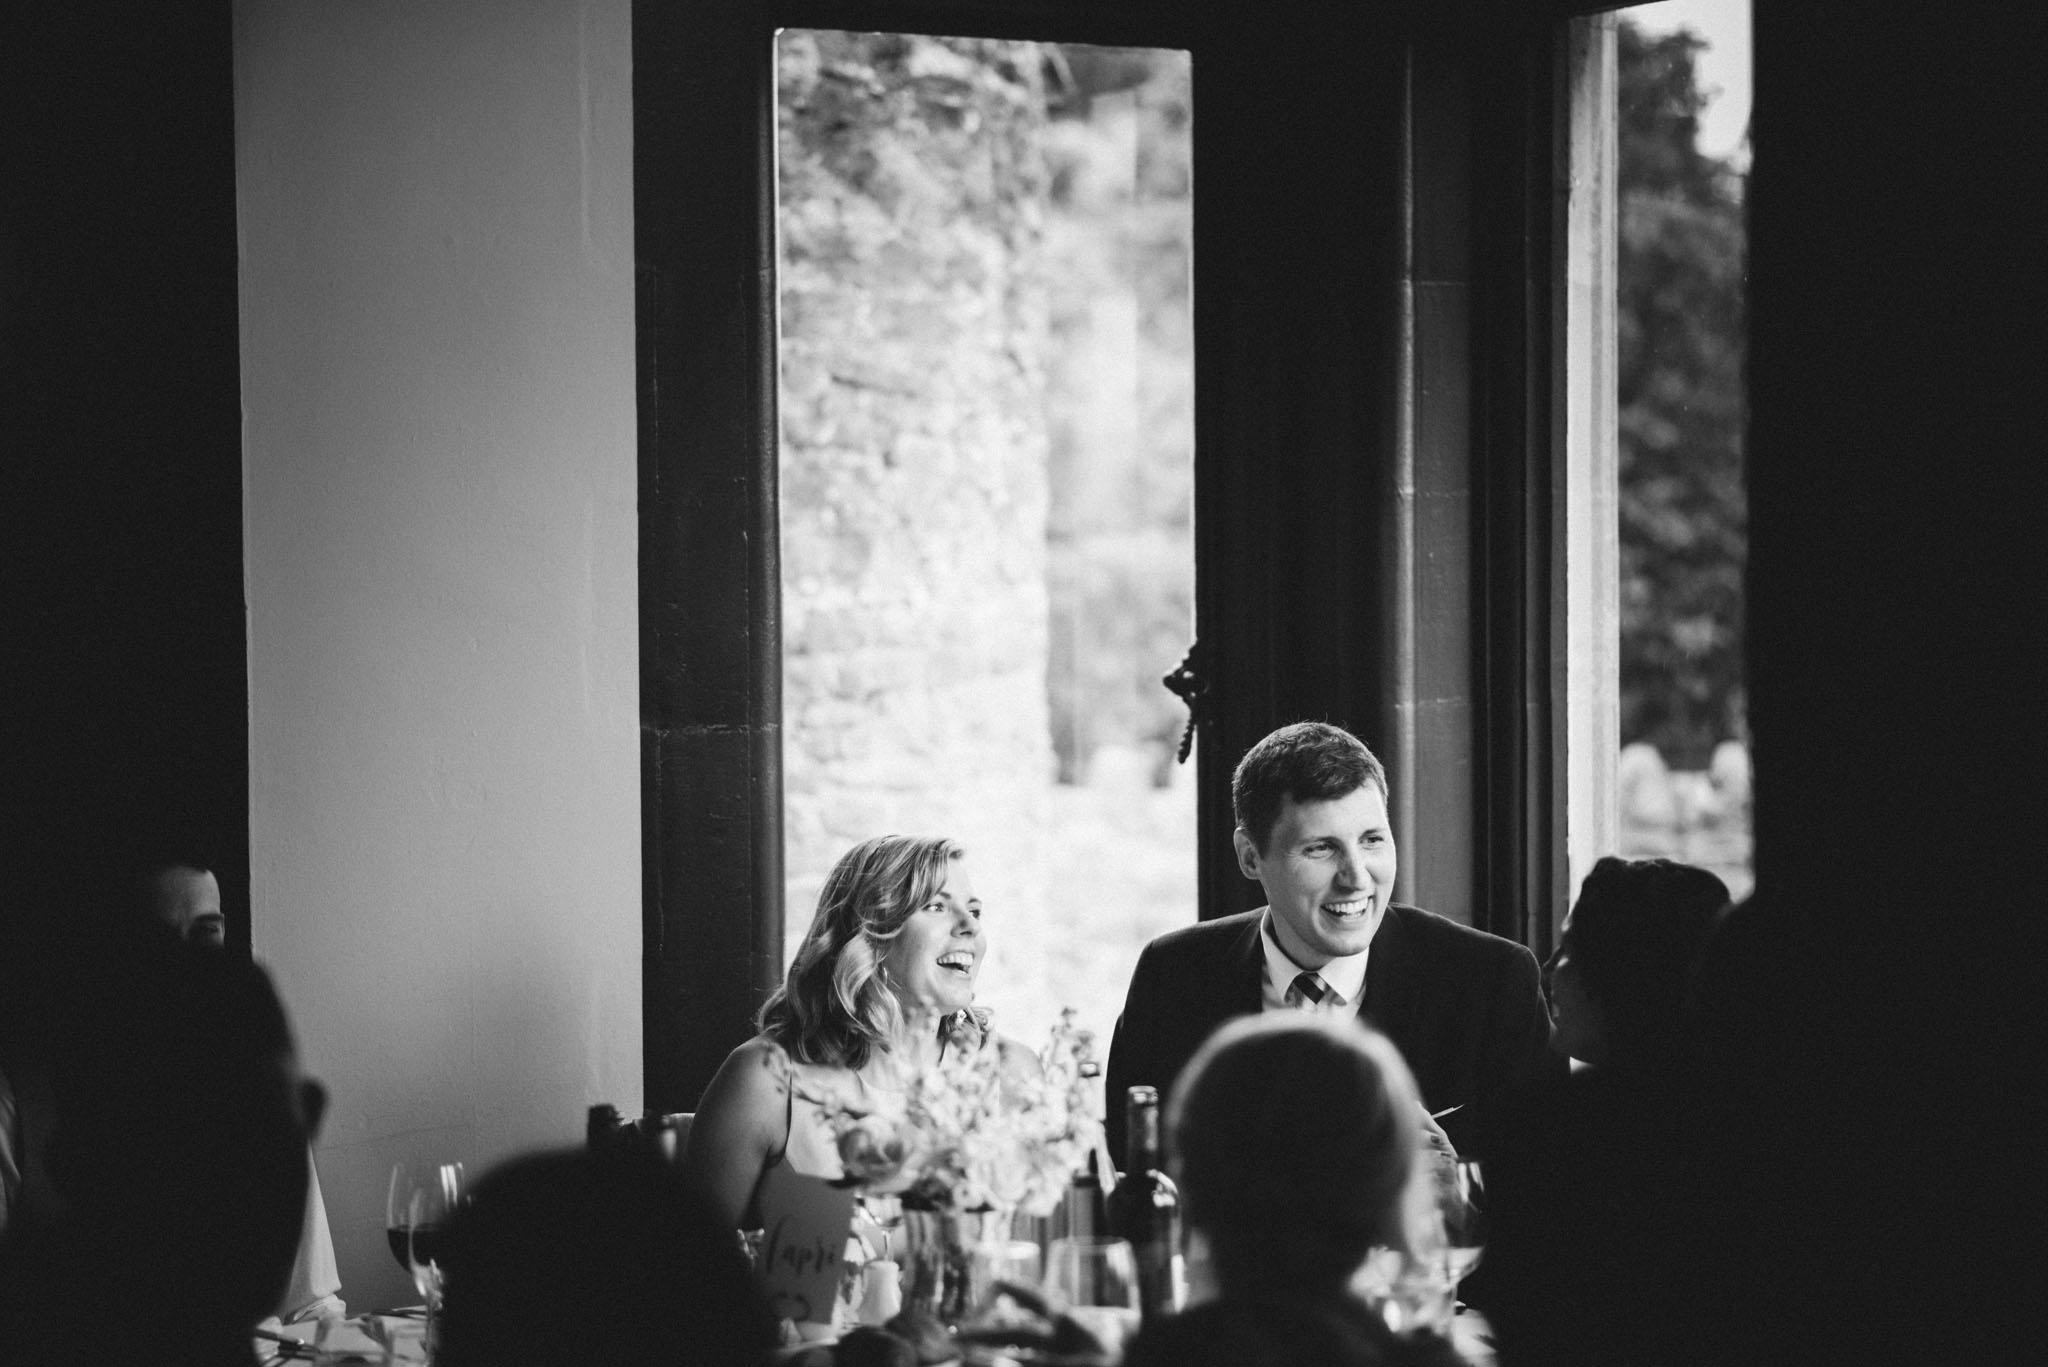 wedding-photographer-glewstone-court-hereford-scott-stockwell-photography382.jpg